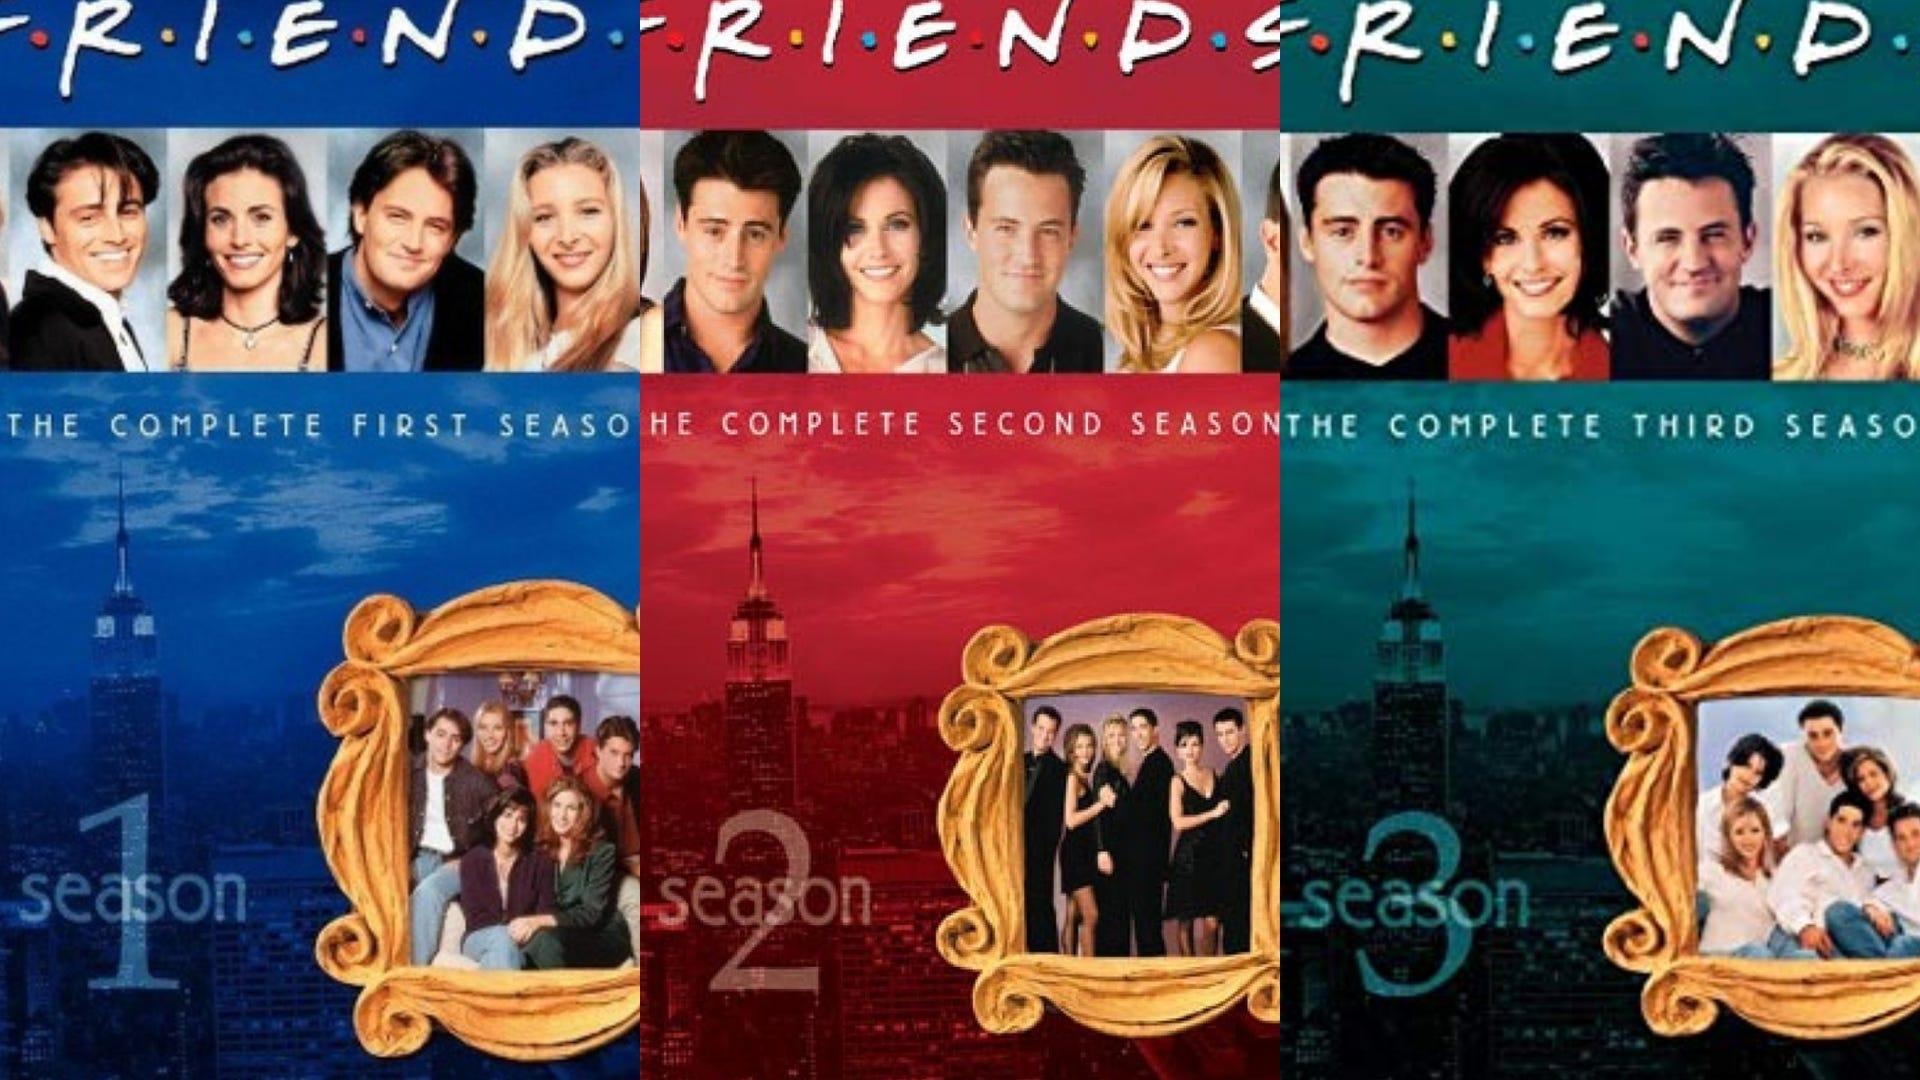 FRIENDS DVDs